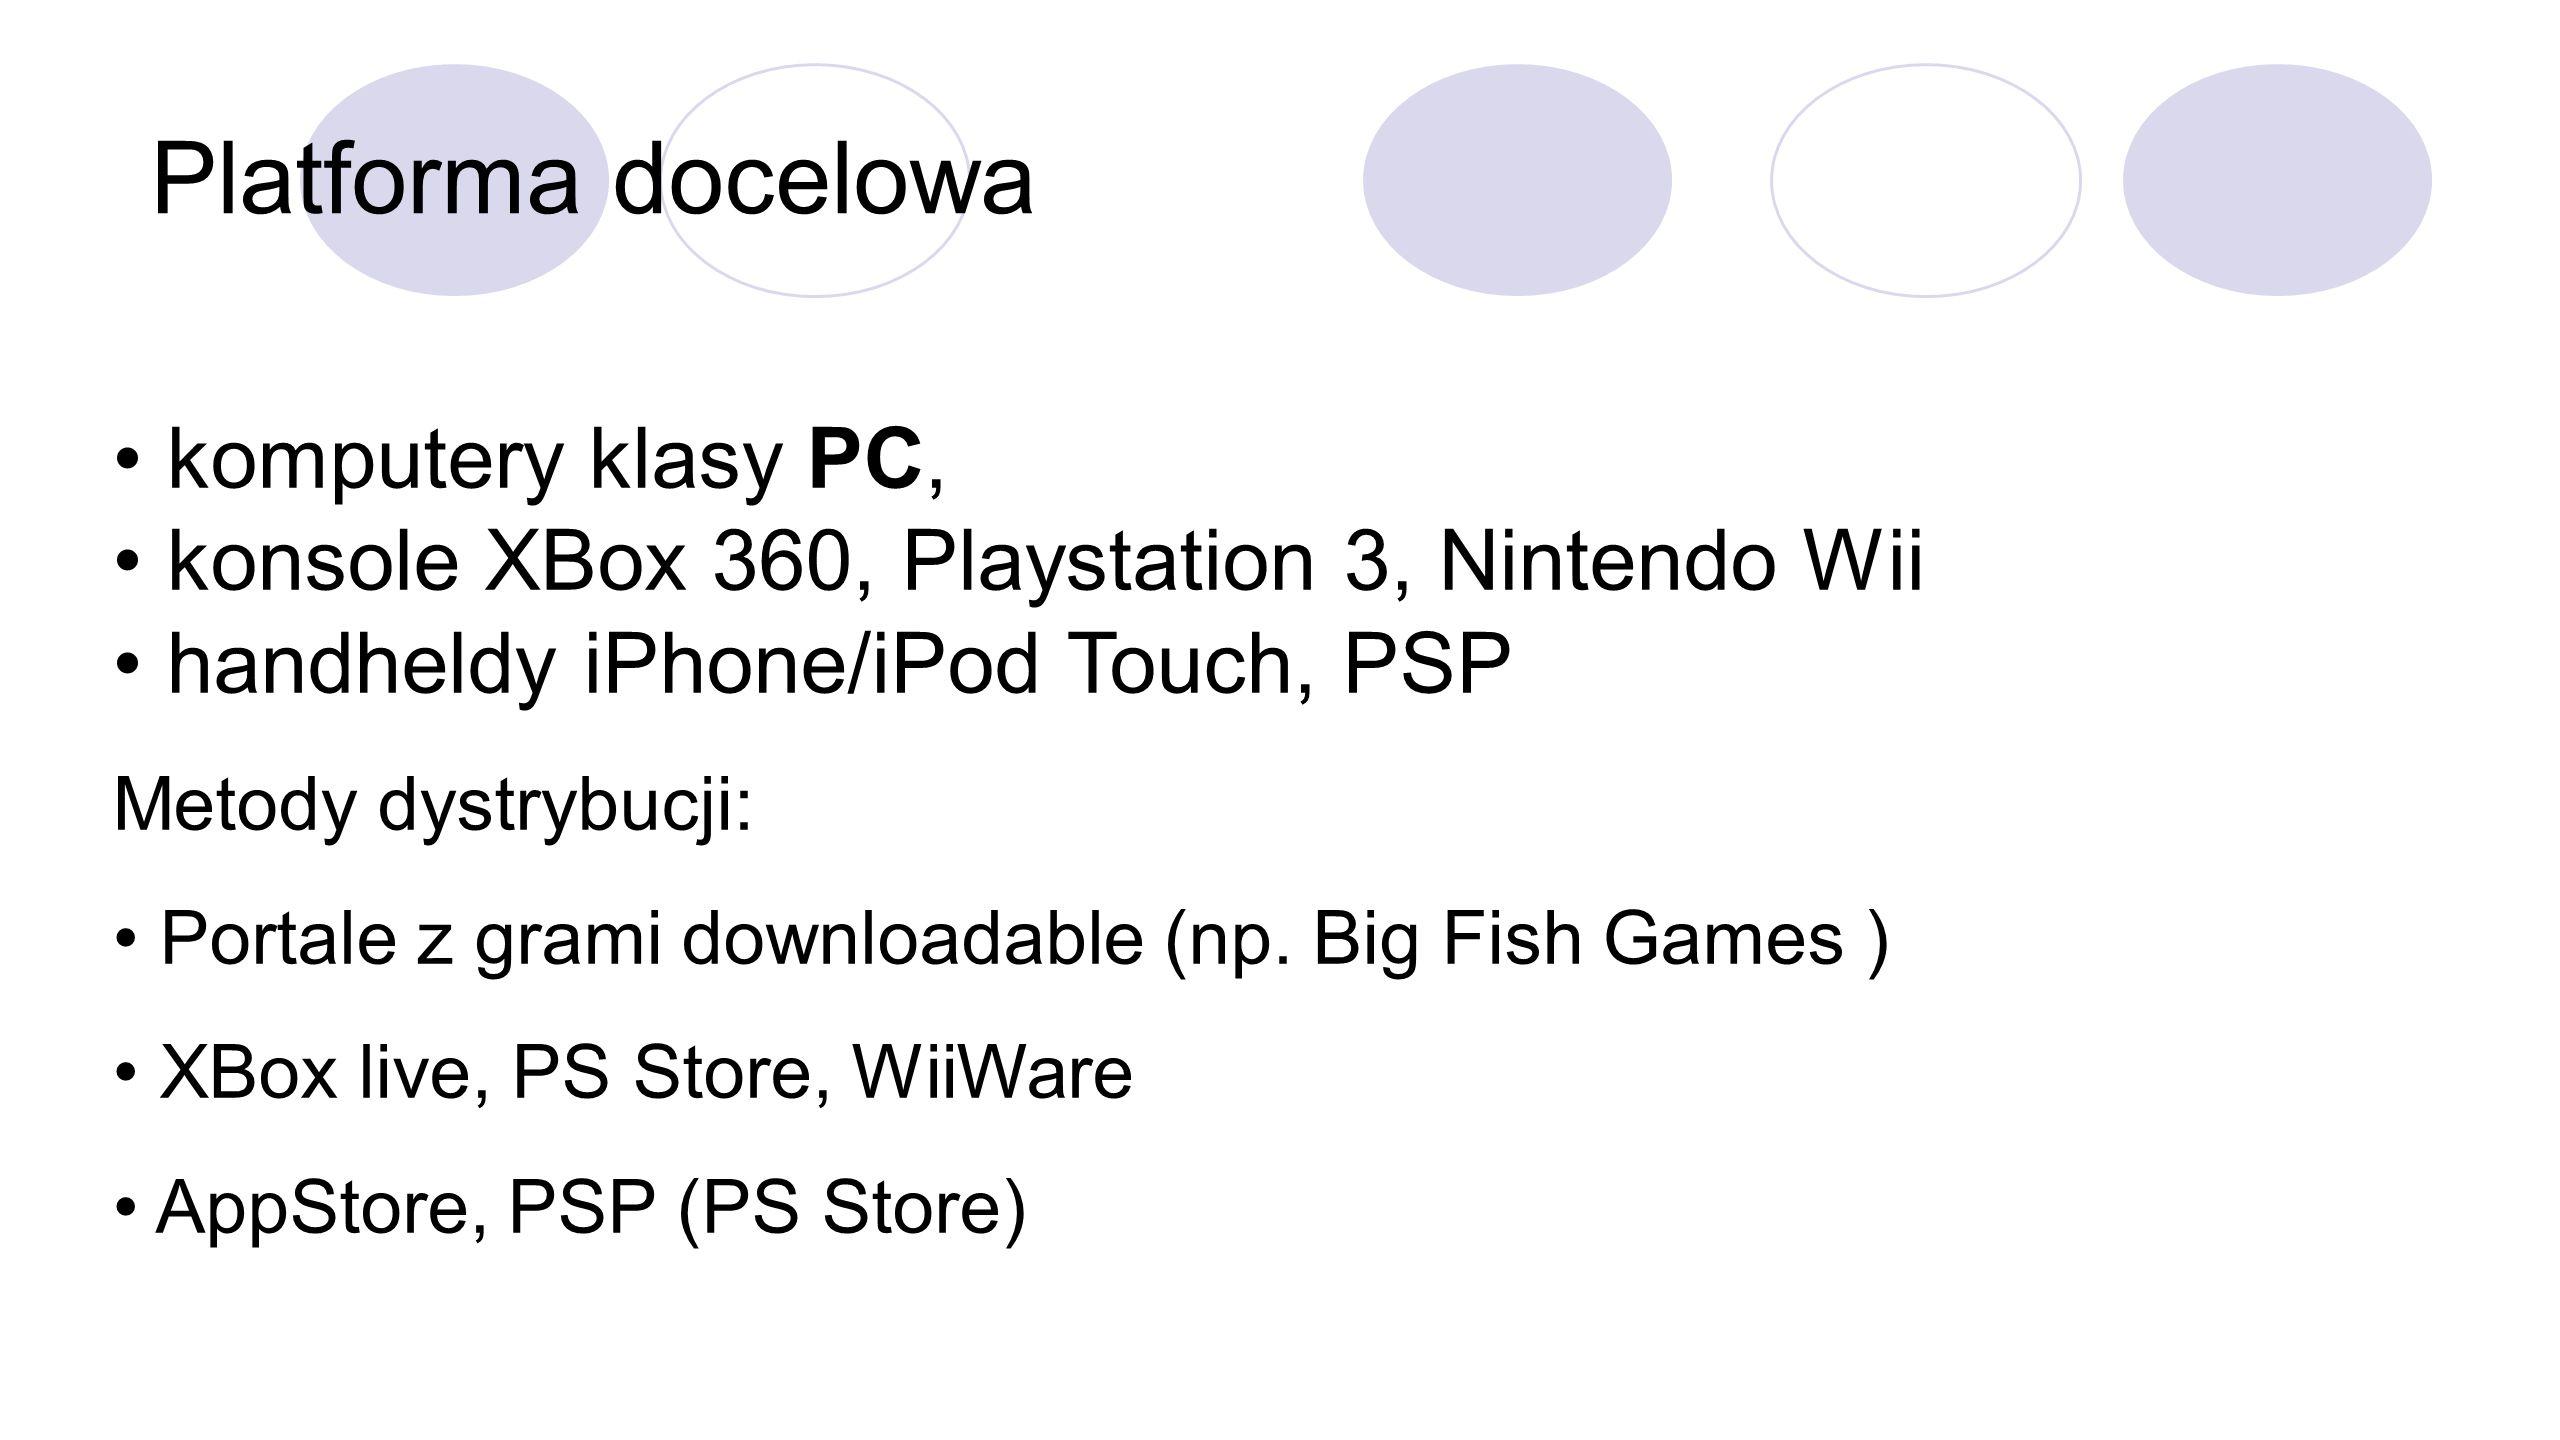 Platforma docelowa komputery klasy PC, konsole XBox 360, Playstation 3, Nintendo Wii handheldy iPhone/iPod Touch, PSP Metody dystrybucji: Portale z grami downloadable (np.